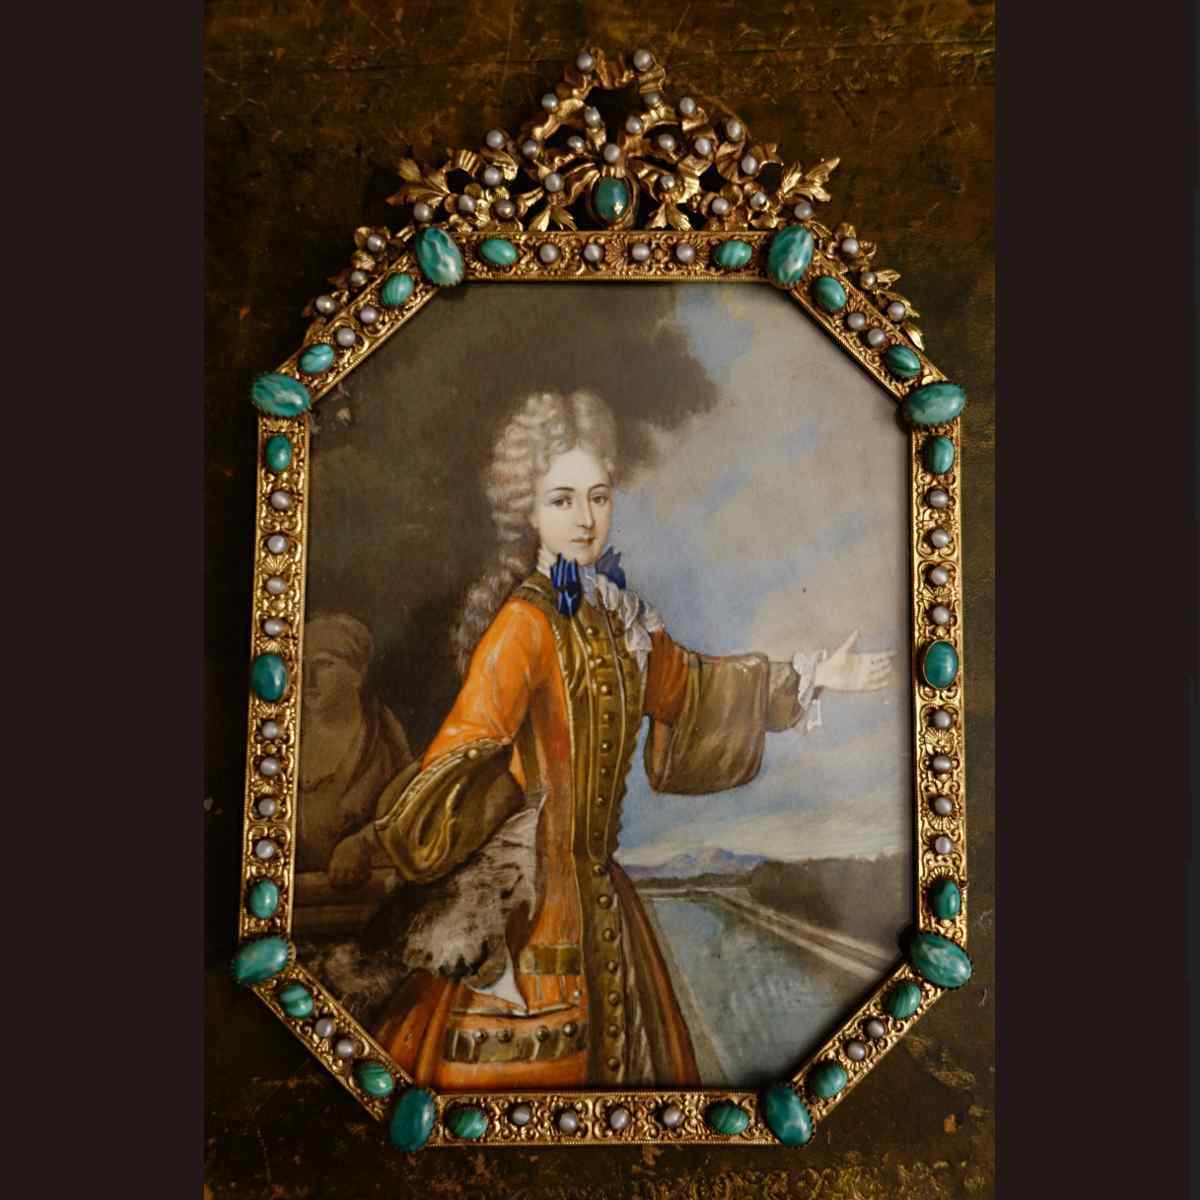 Grande Miniature XVIIIè de Mademoiselle AdelaÏde de Savoie